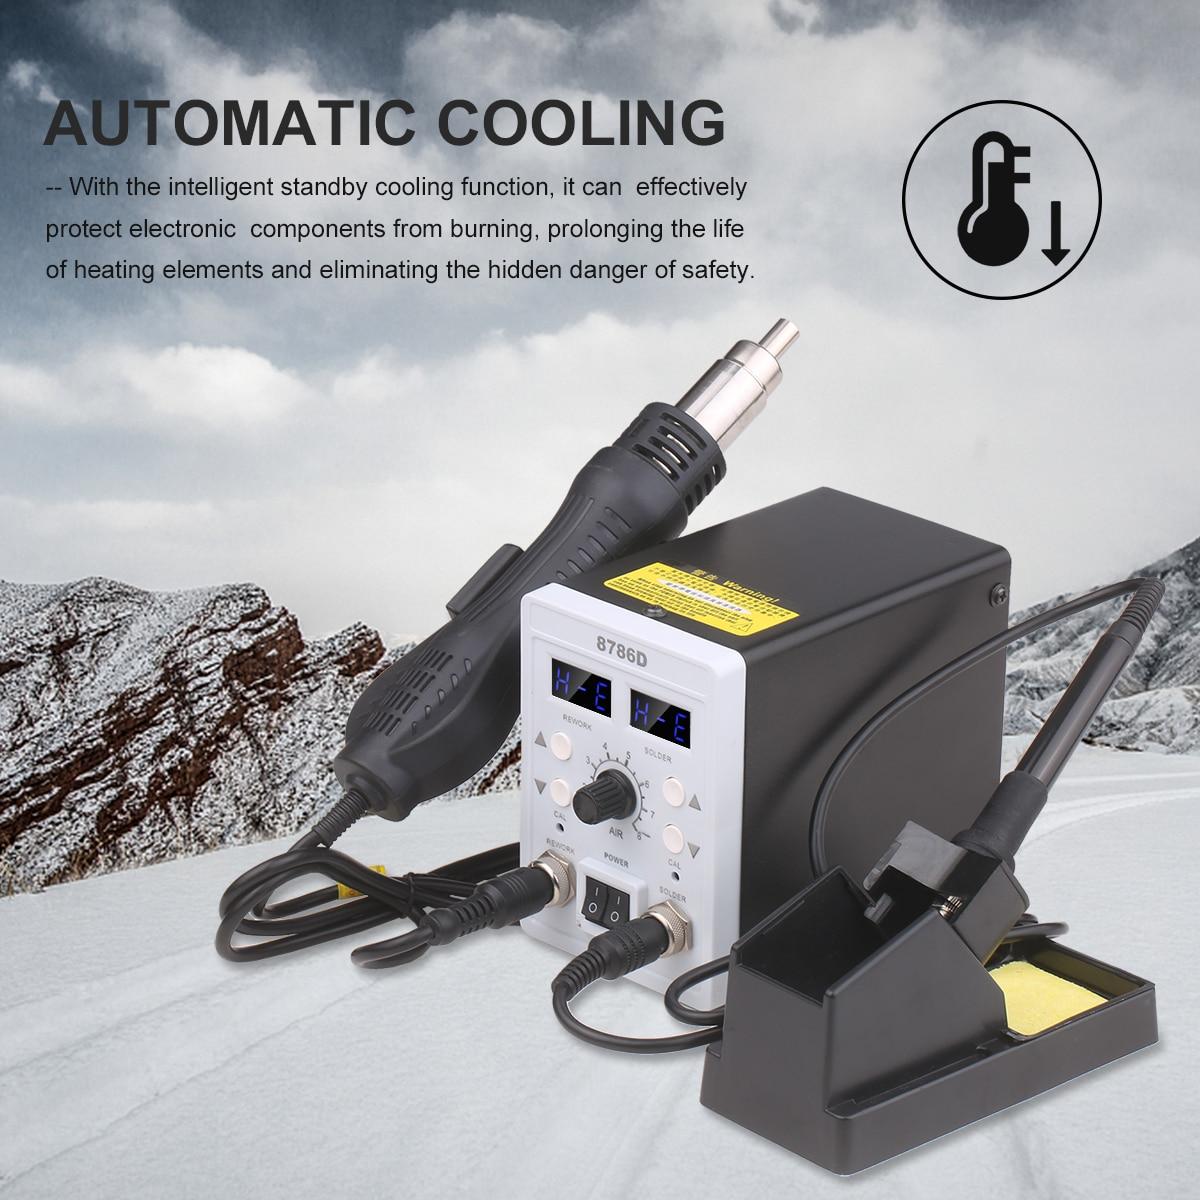 Digital Solder Station 2 in 1 Dual Display Air Blower Heat Gun Intelligent Detection Cool Air Welding Soldering Iron Repair Tool